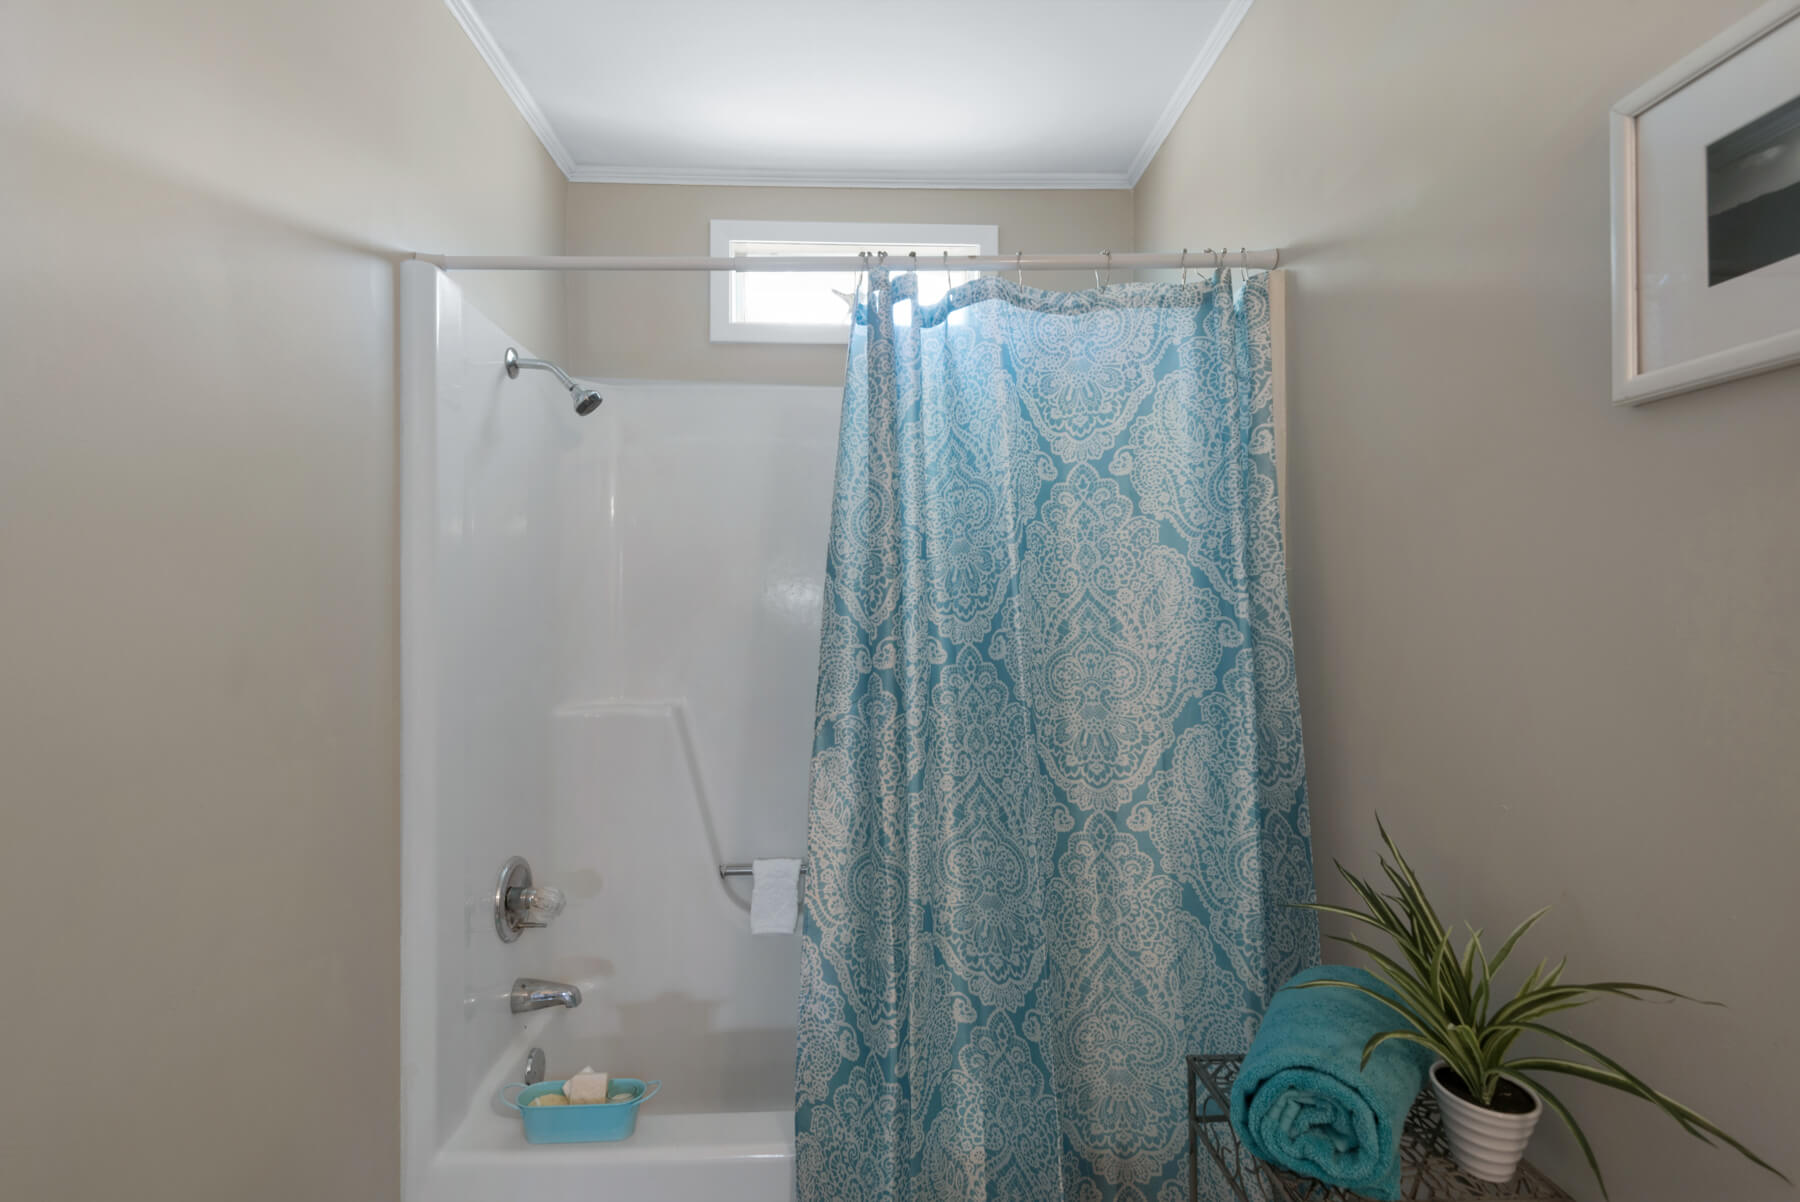 7466 Twin Beech Road Fairhope for Sale Urban Property bathroom view 2